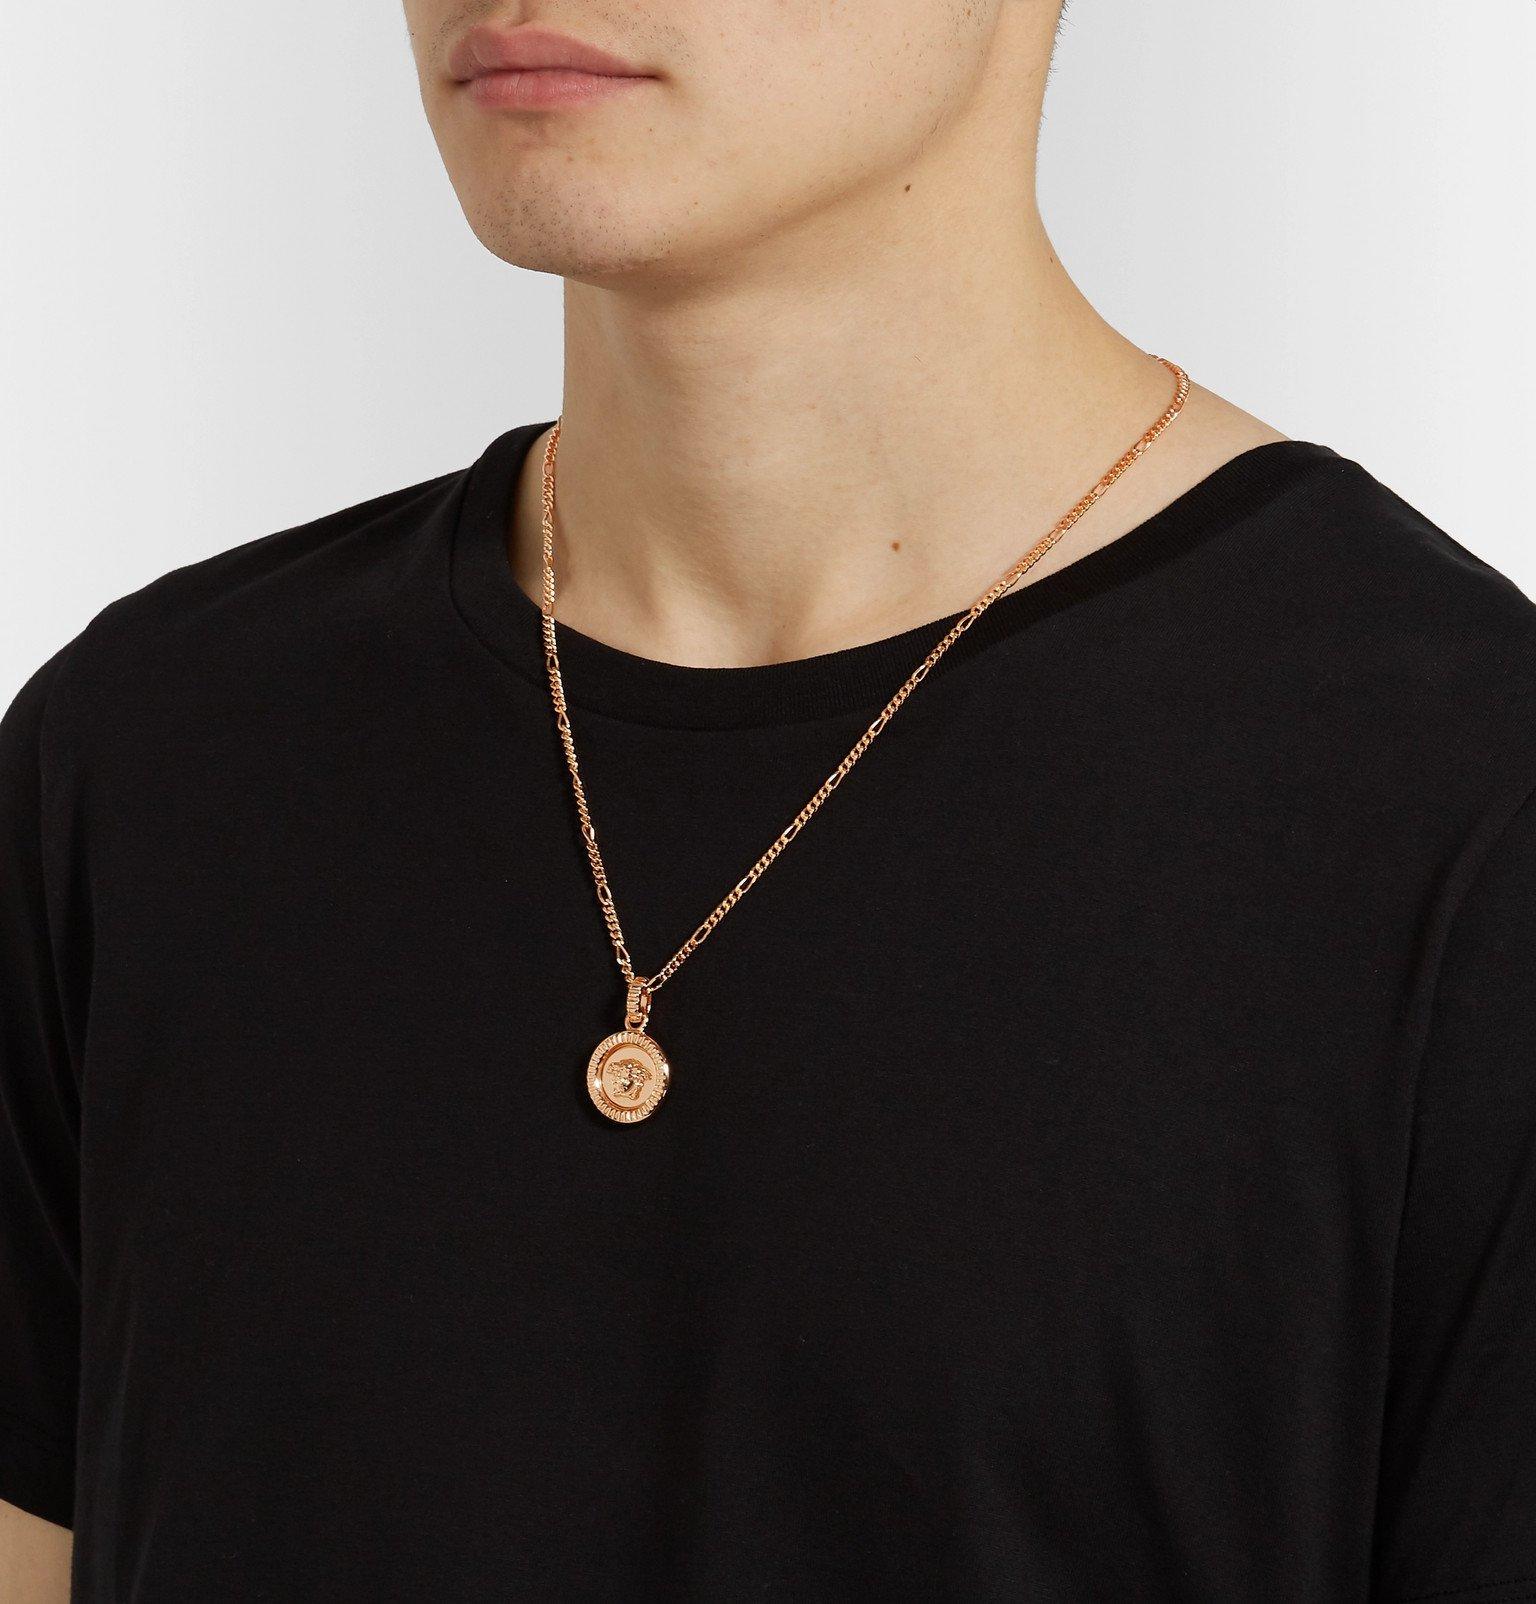 Versace - Medusa Gold-Tone Necklace - Gold